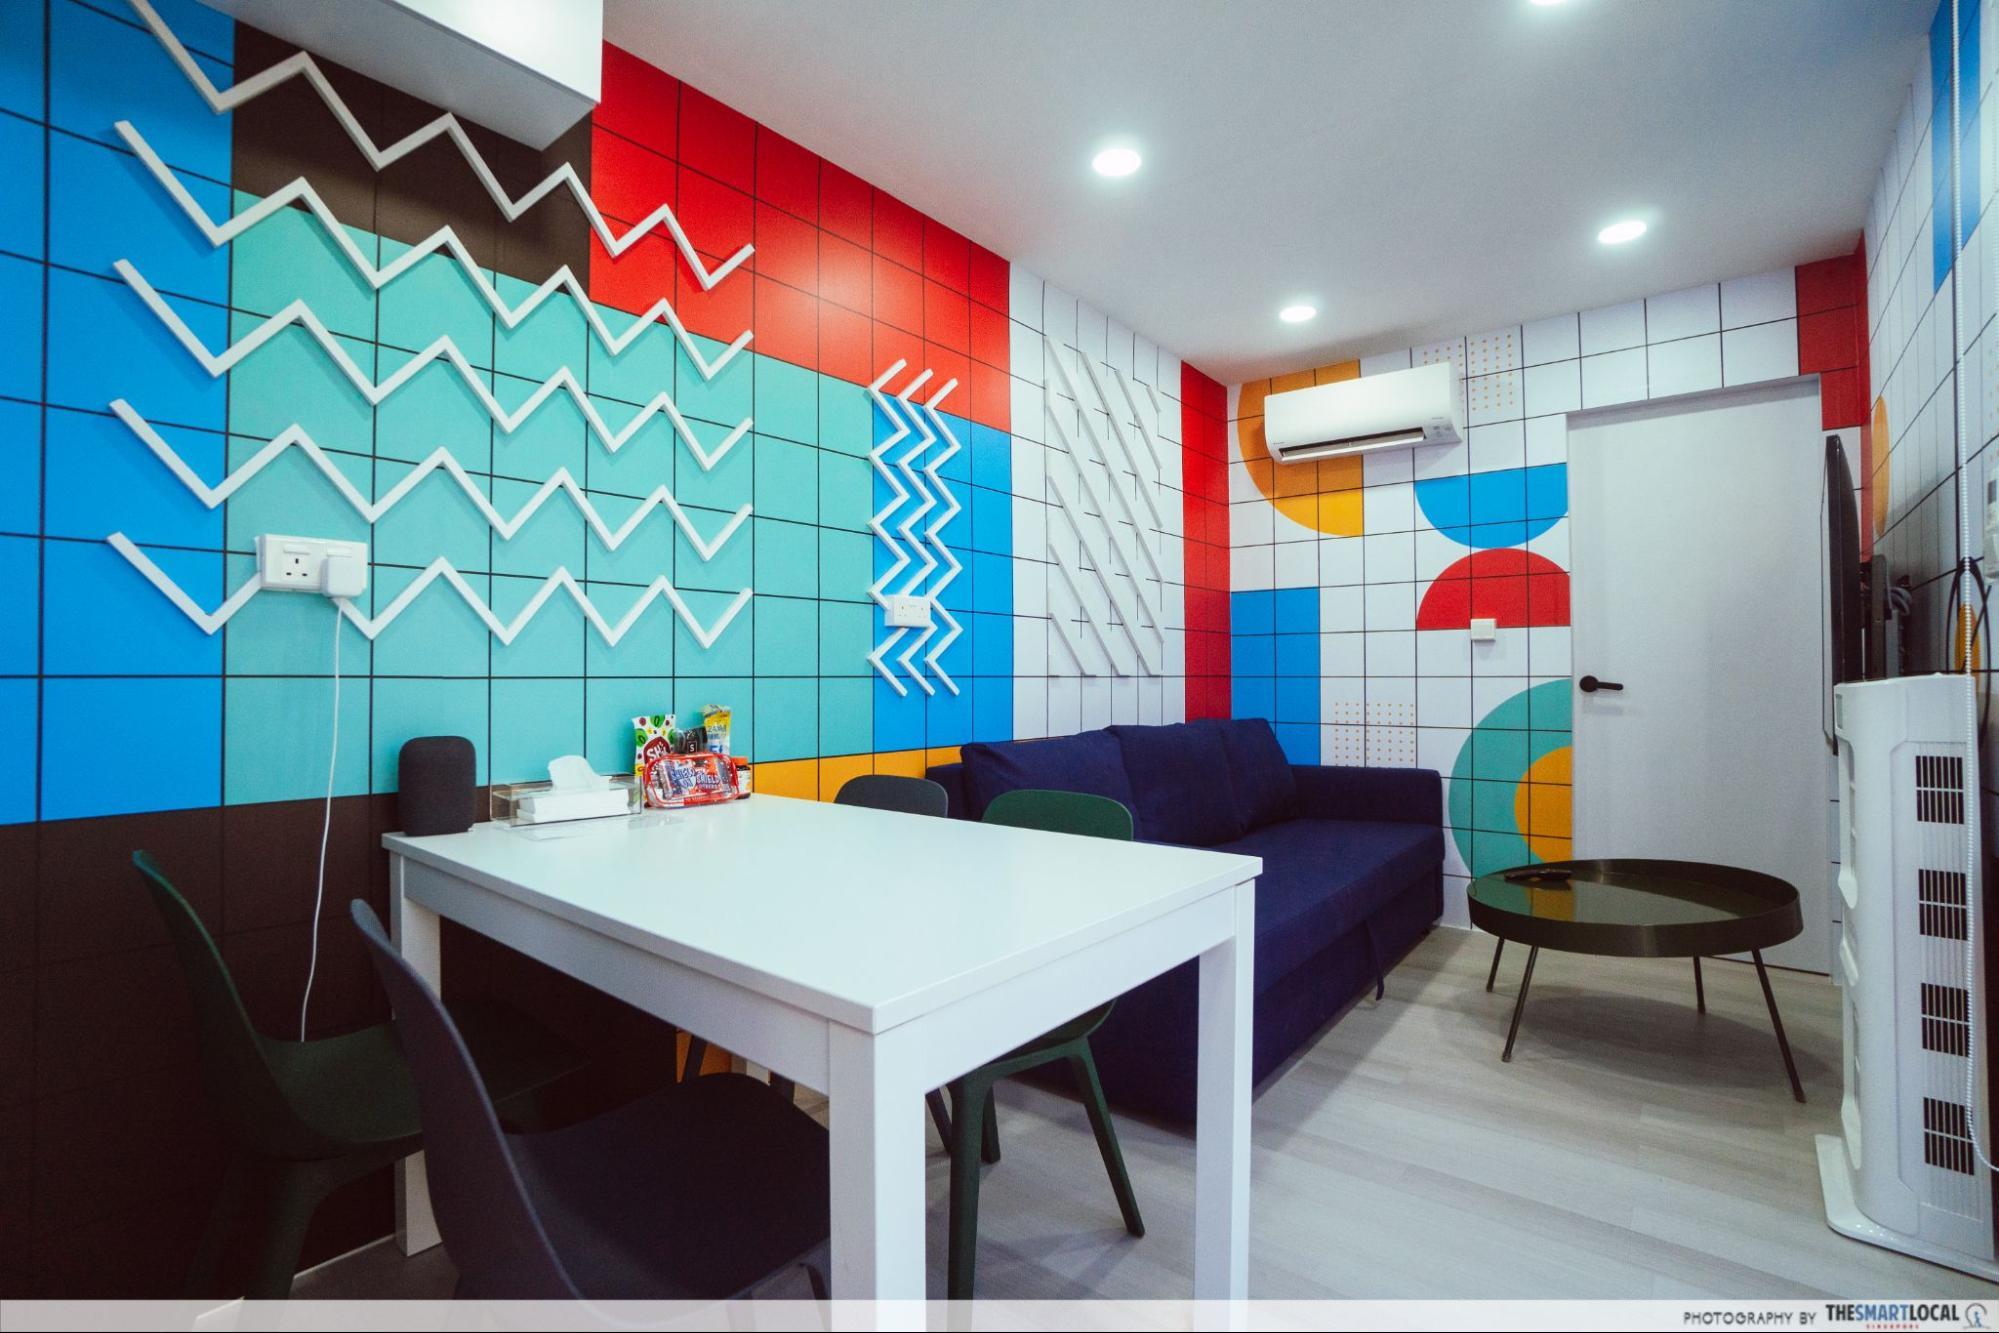 SG hotel on wheels - Pop Art room